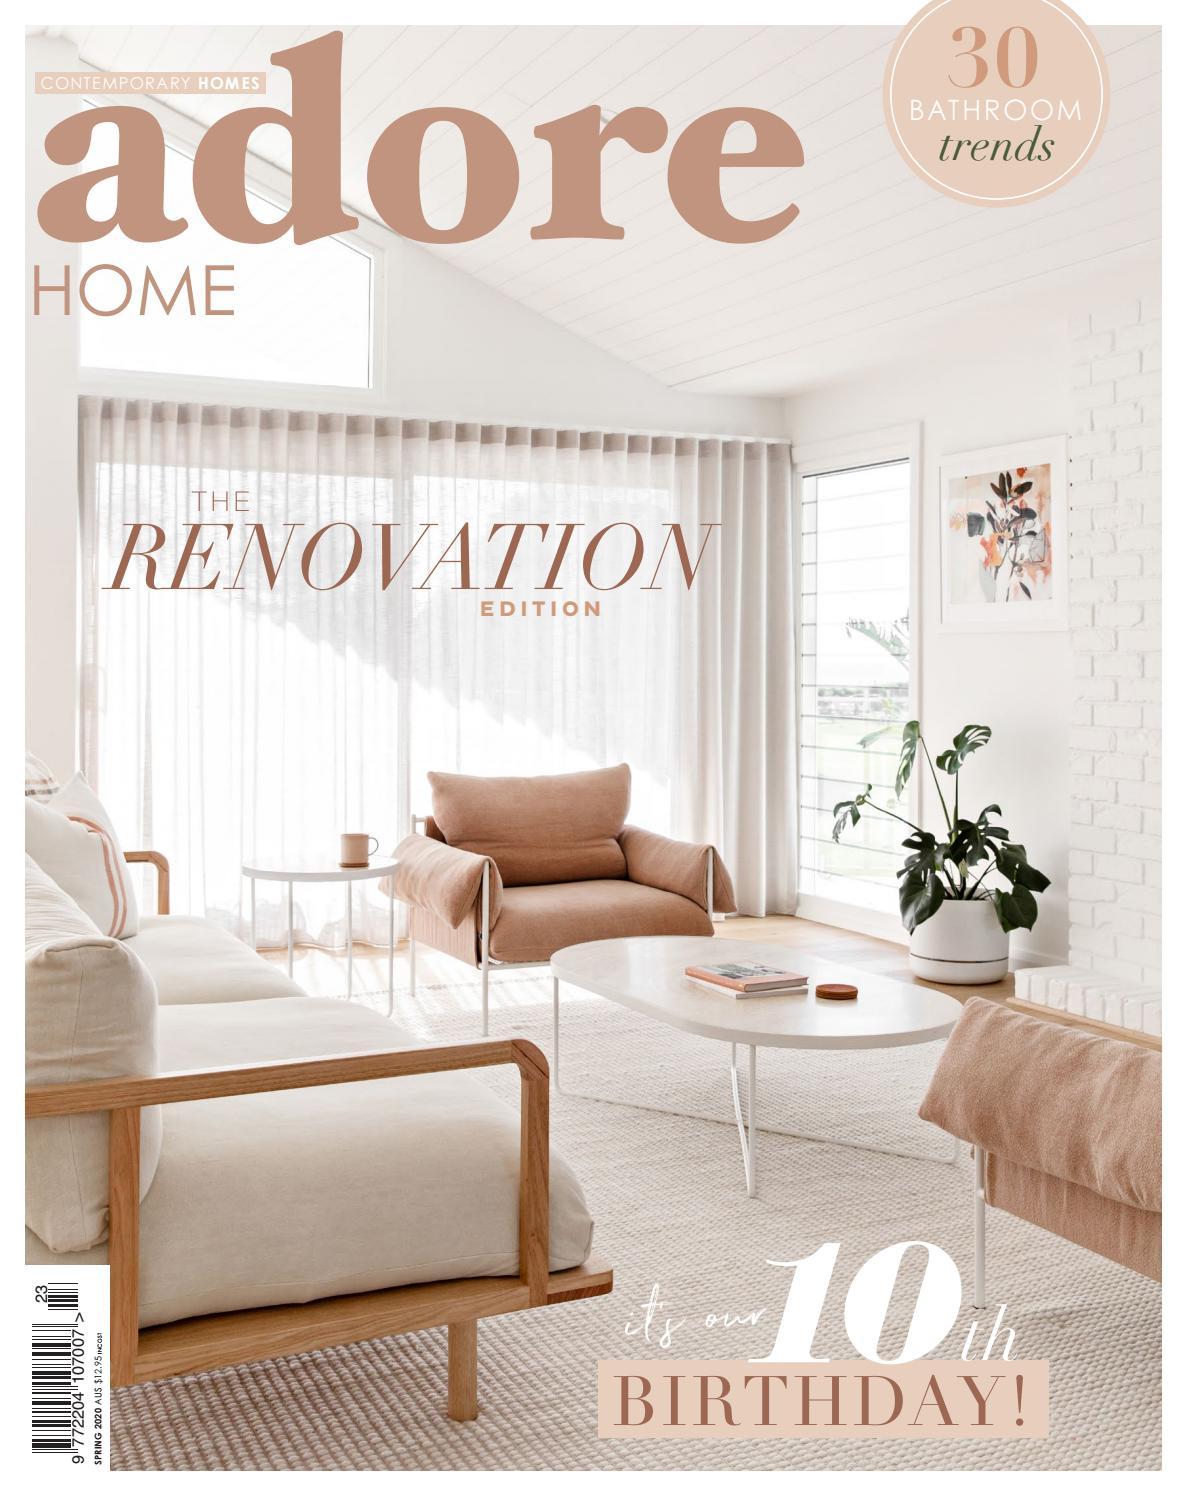 Adore Home Magazine The Renovation Edition Spring 2020 By Adore Home Magazine Issuu